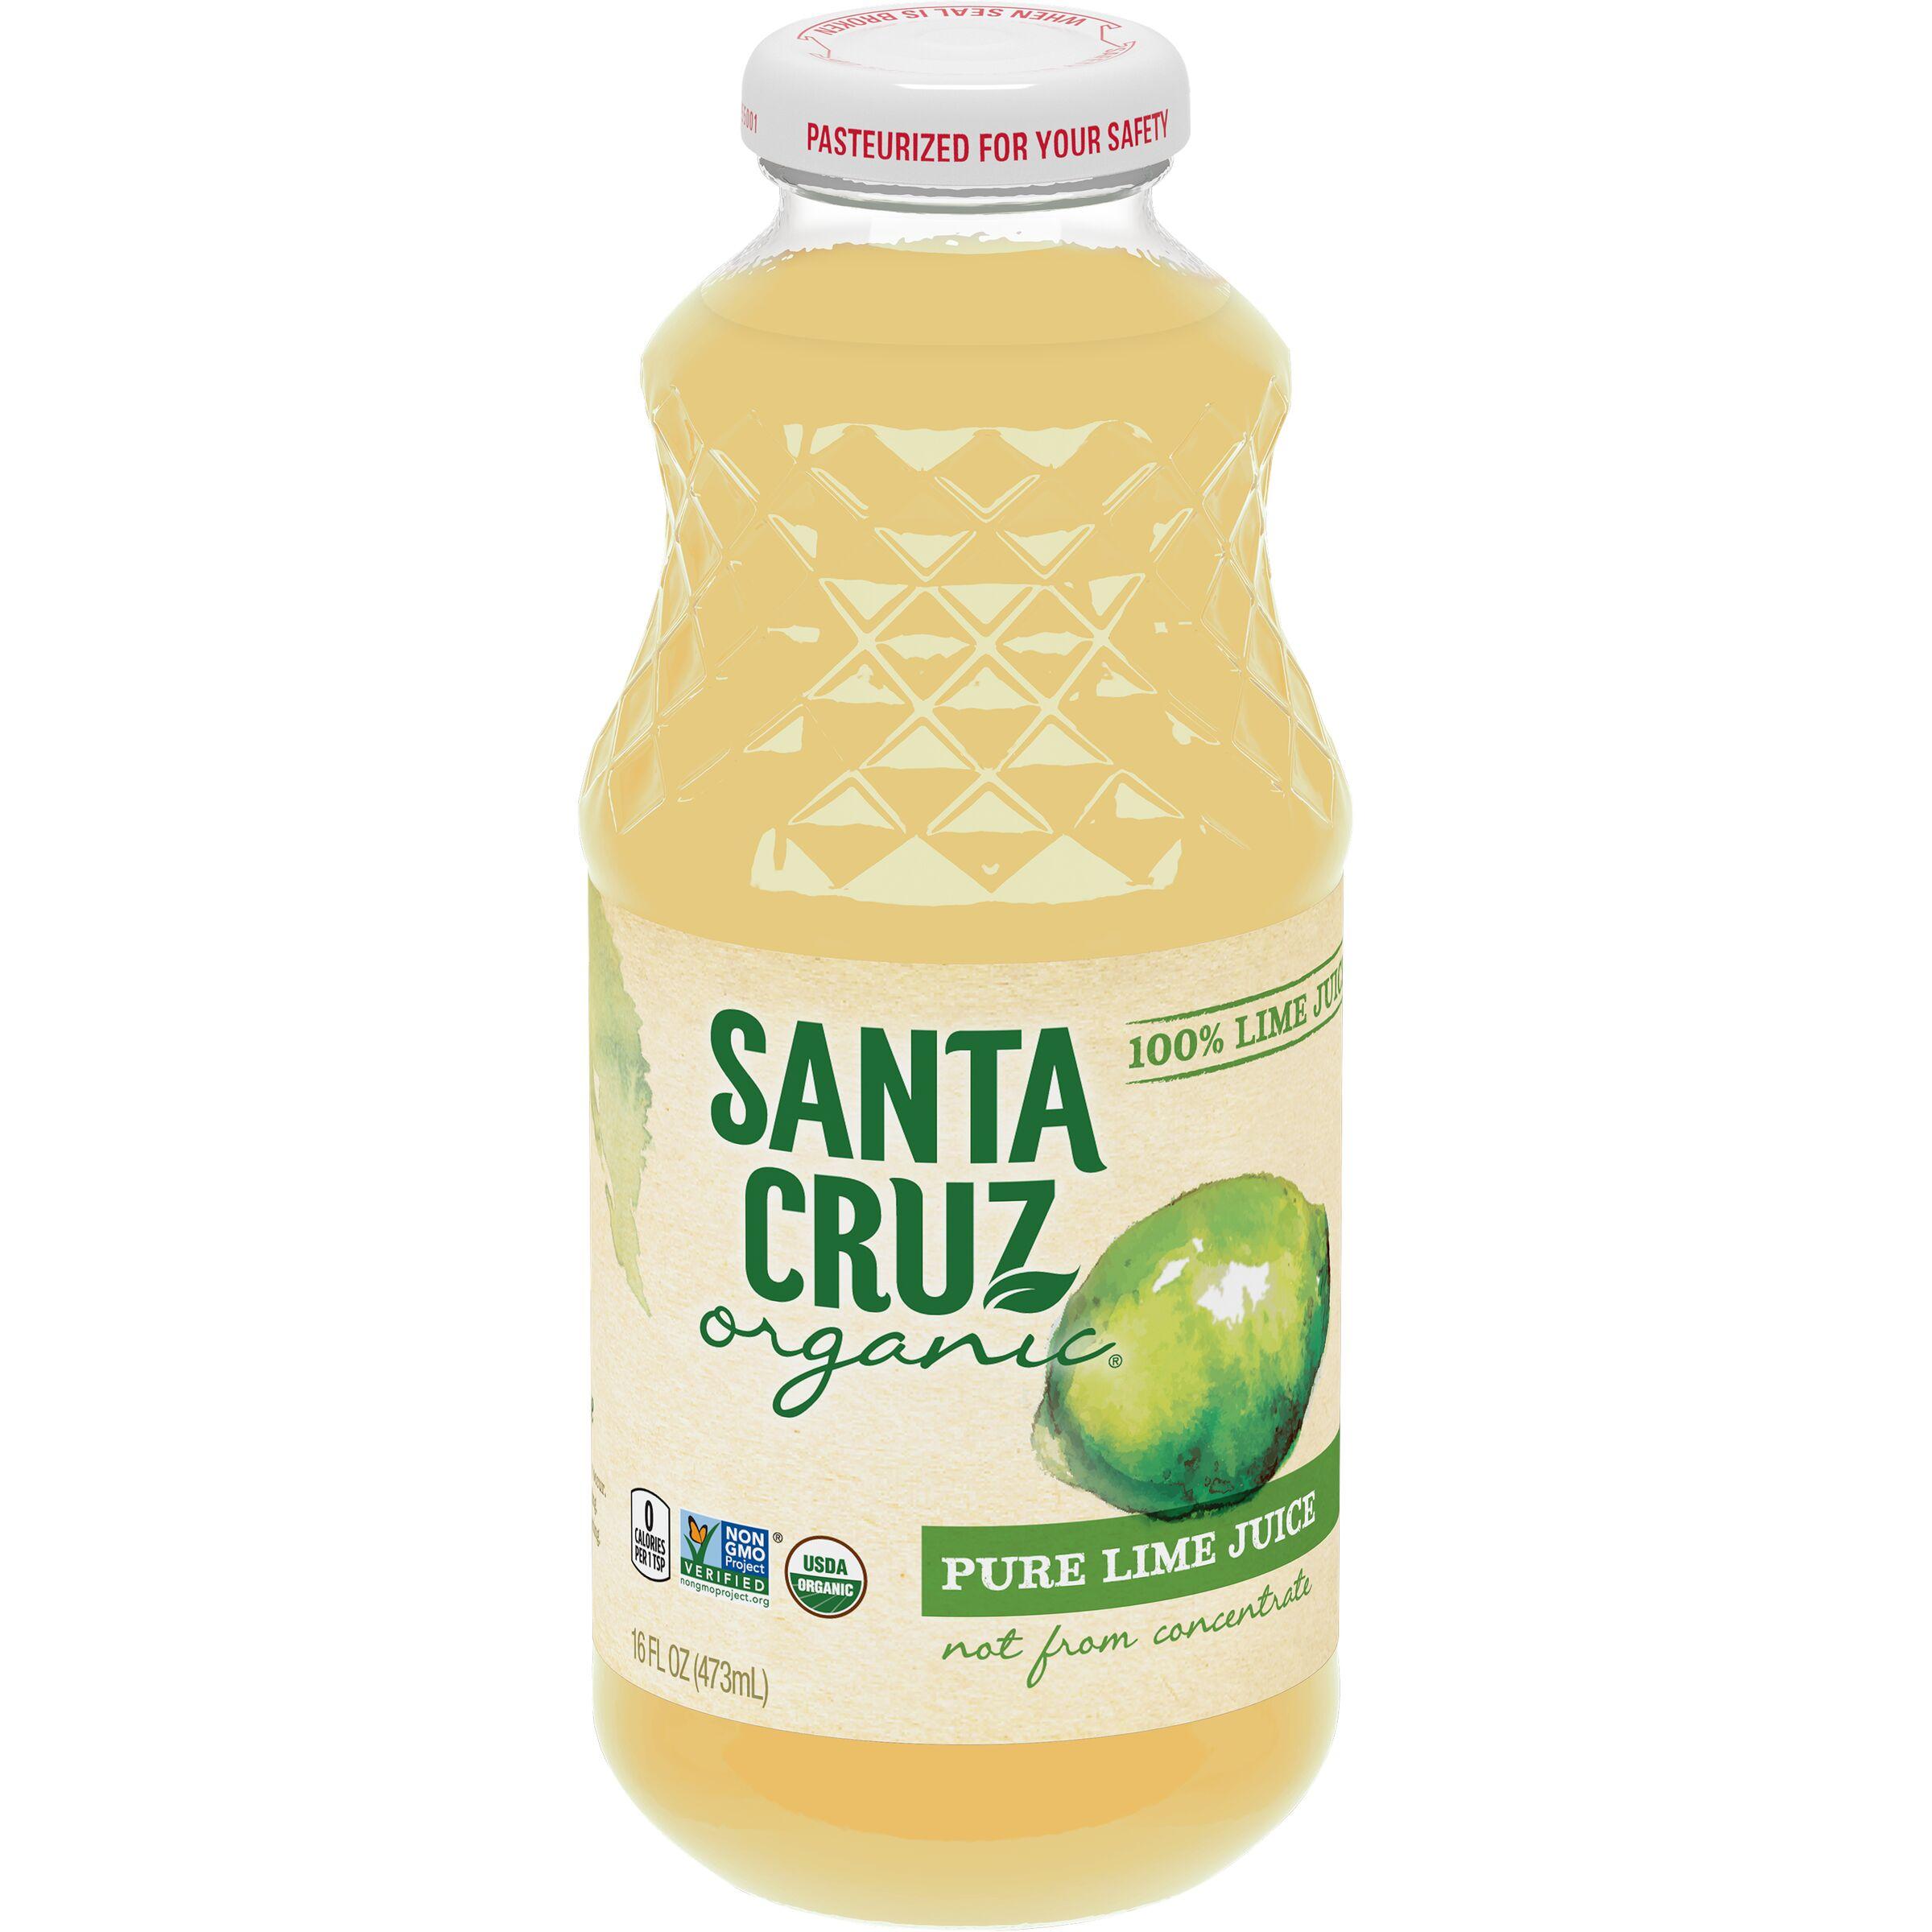 Santa Cruz Organic  100% Lime Juice